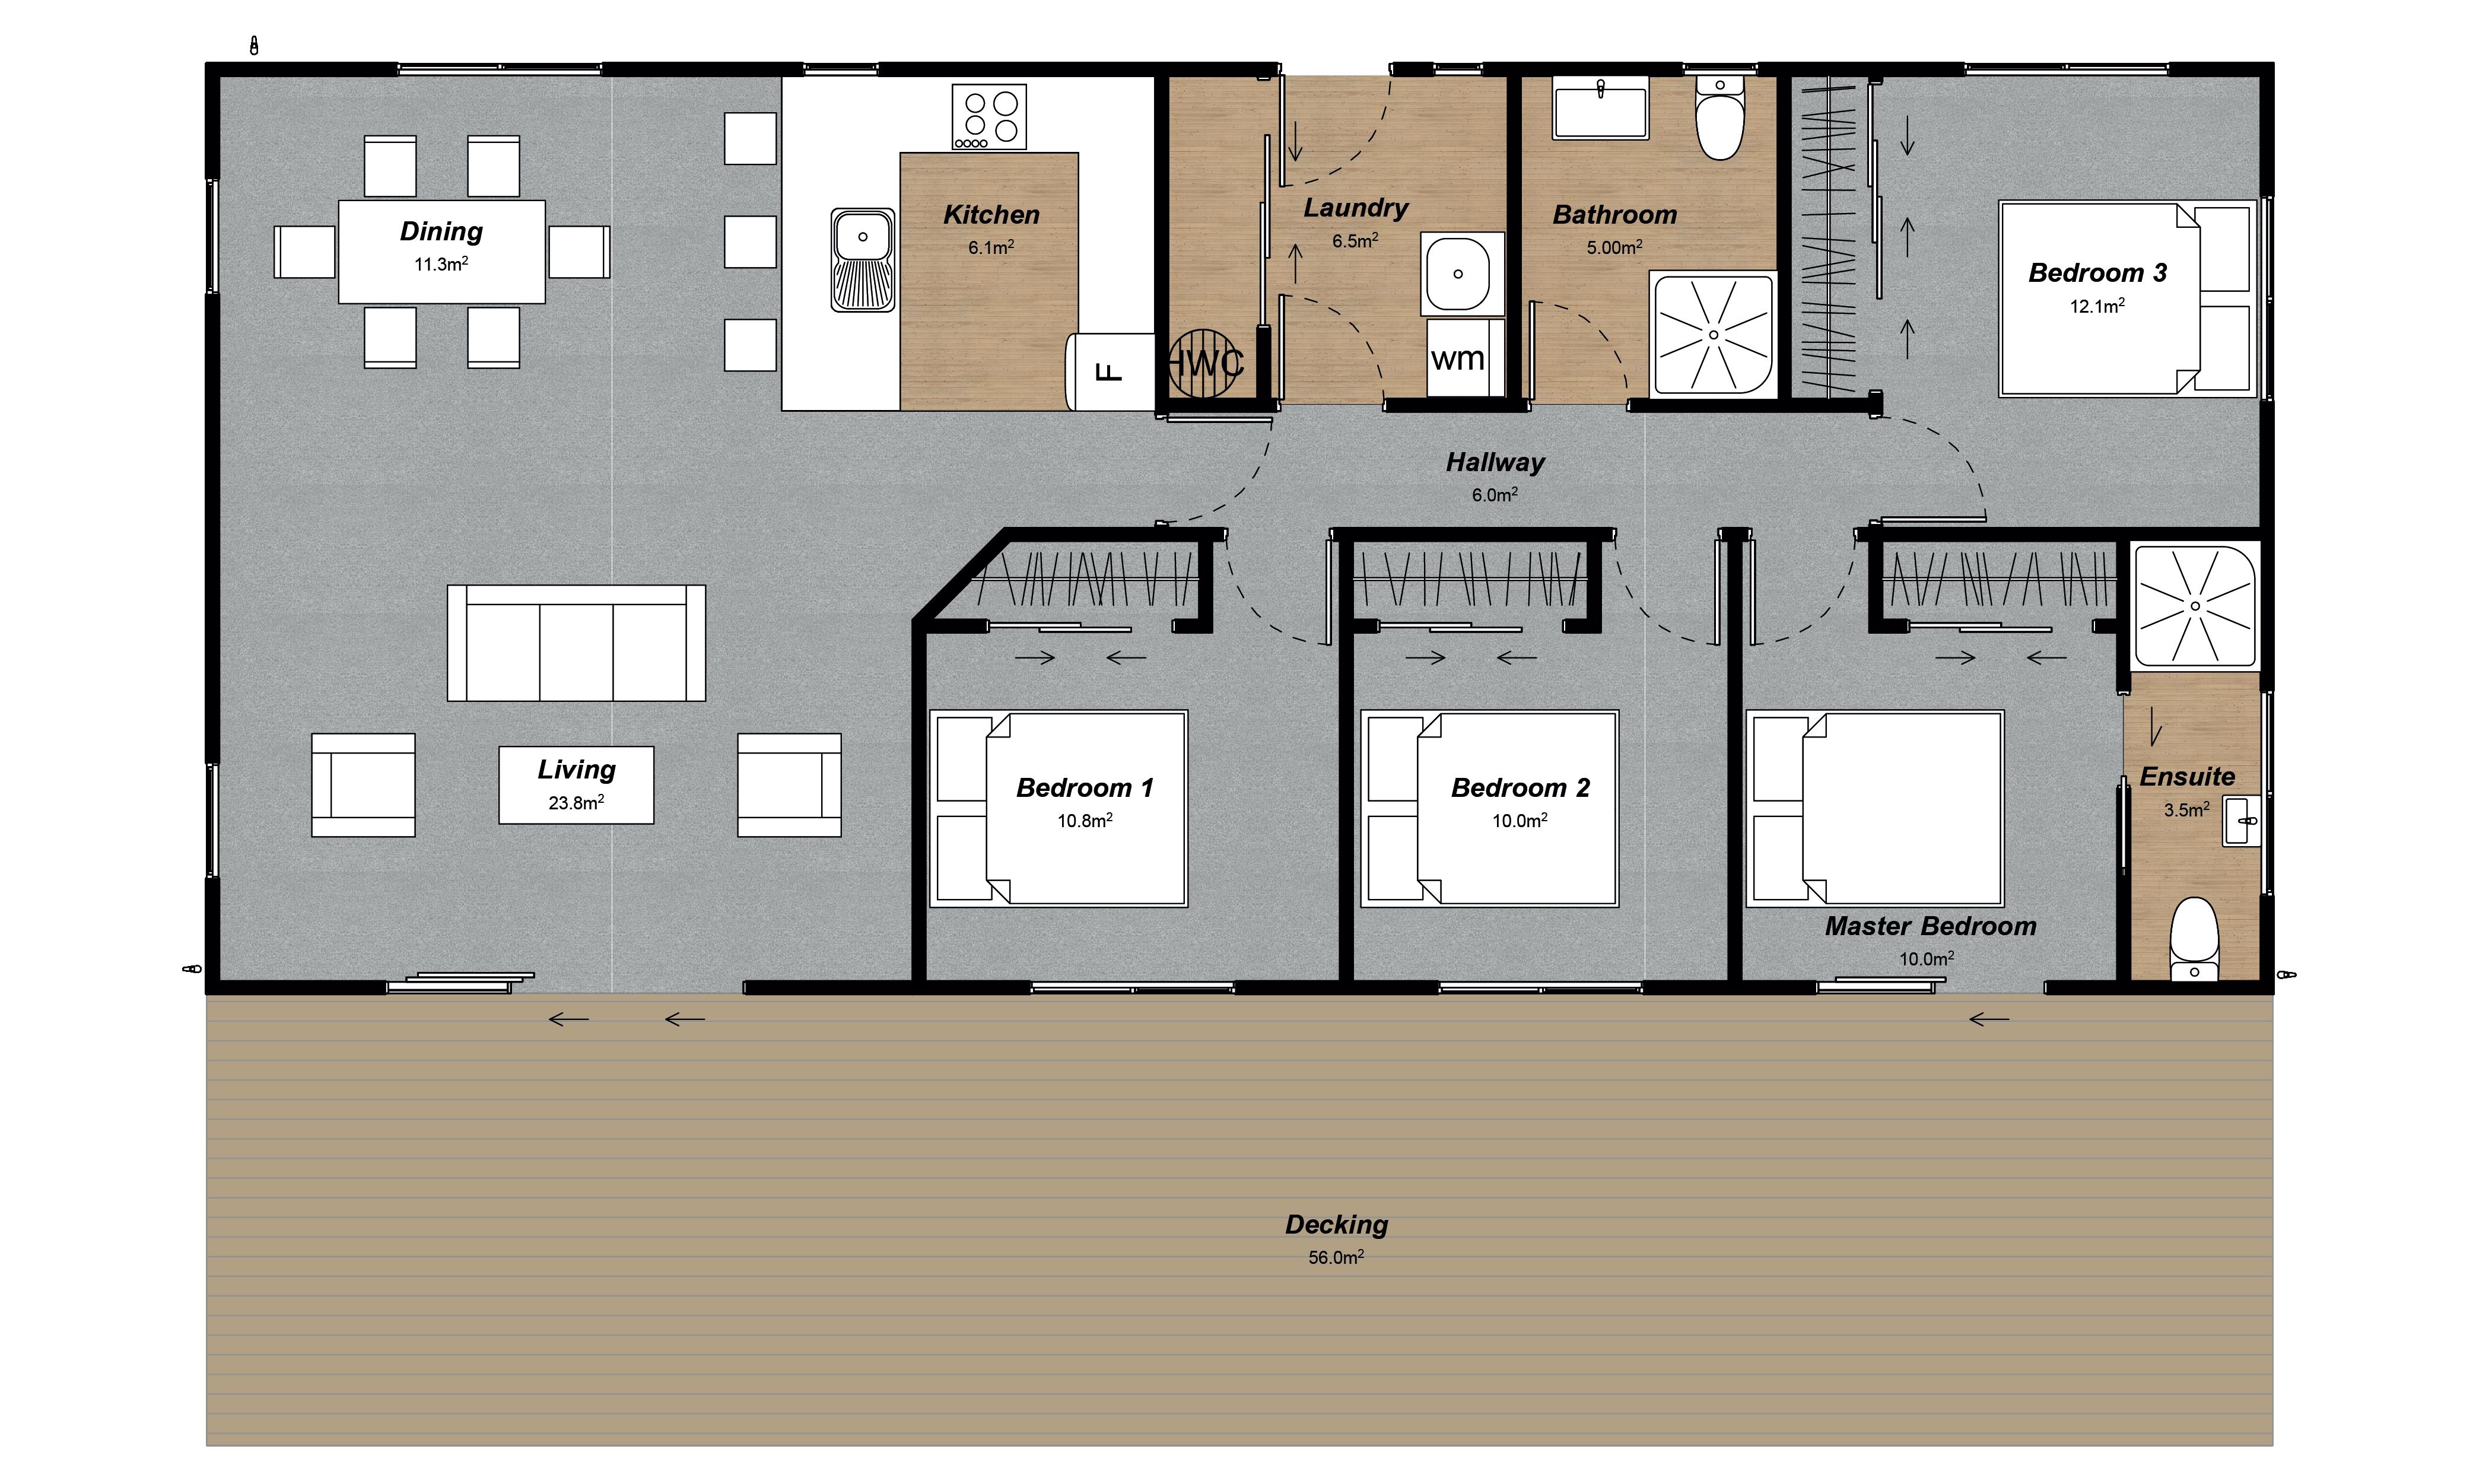 Mackenzie modern 4 bedroom house plan